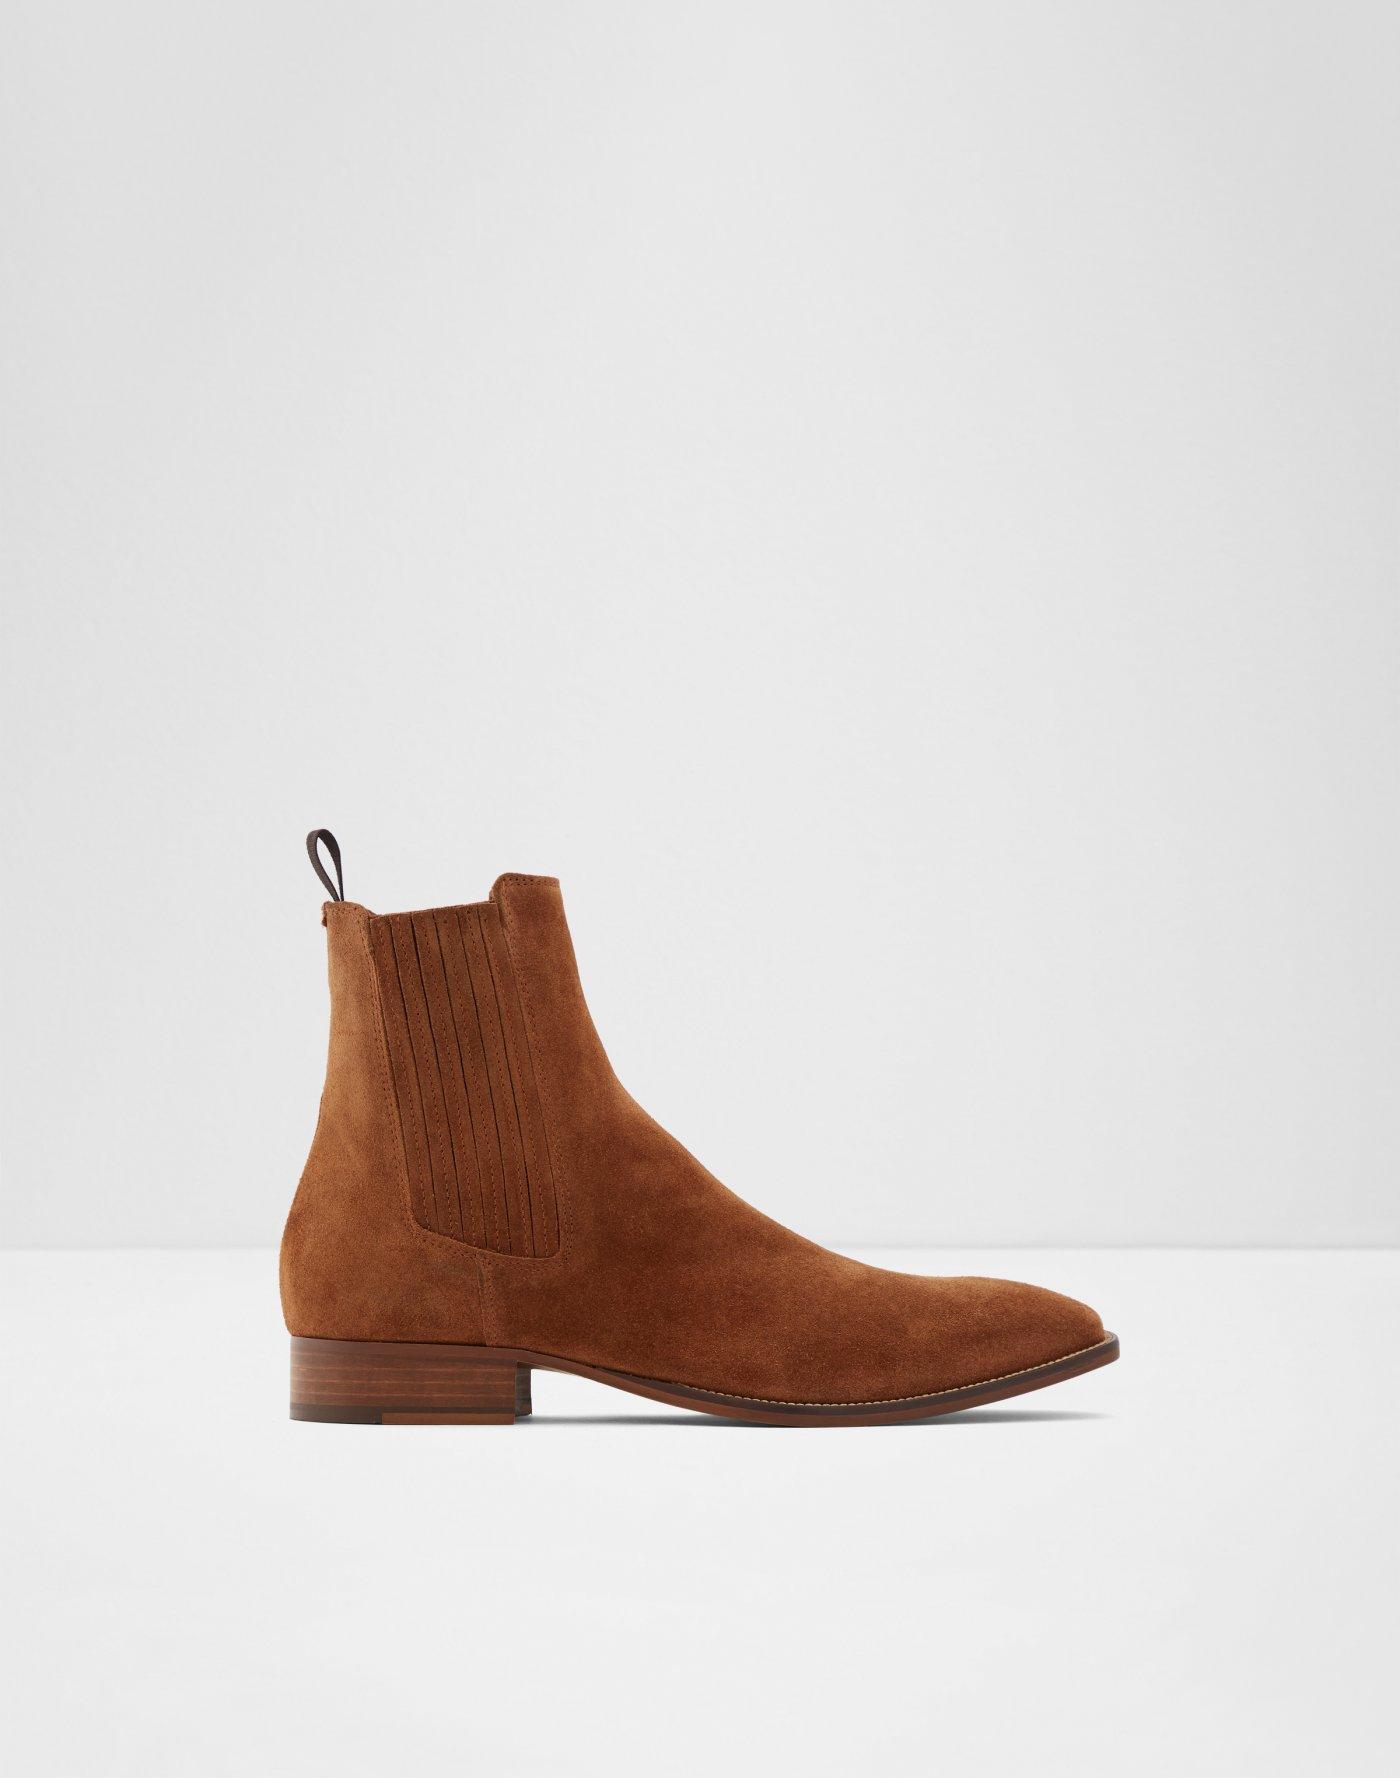 5927096c46c Sonoma chelsea boots black